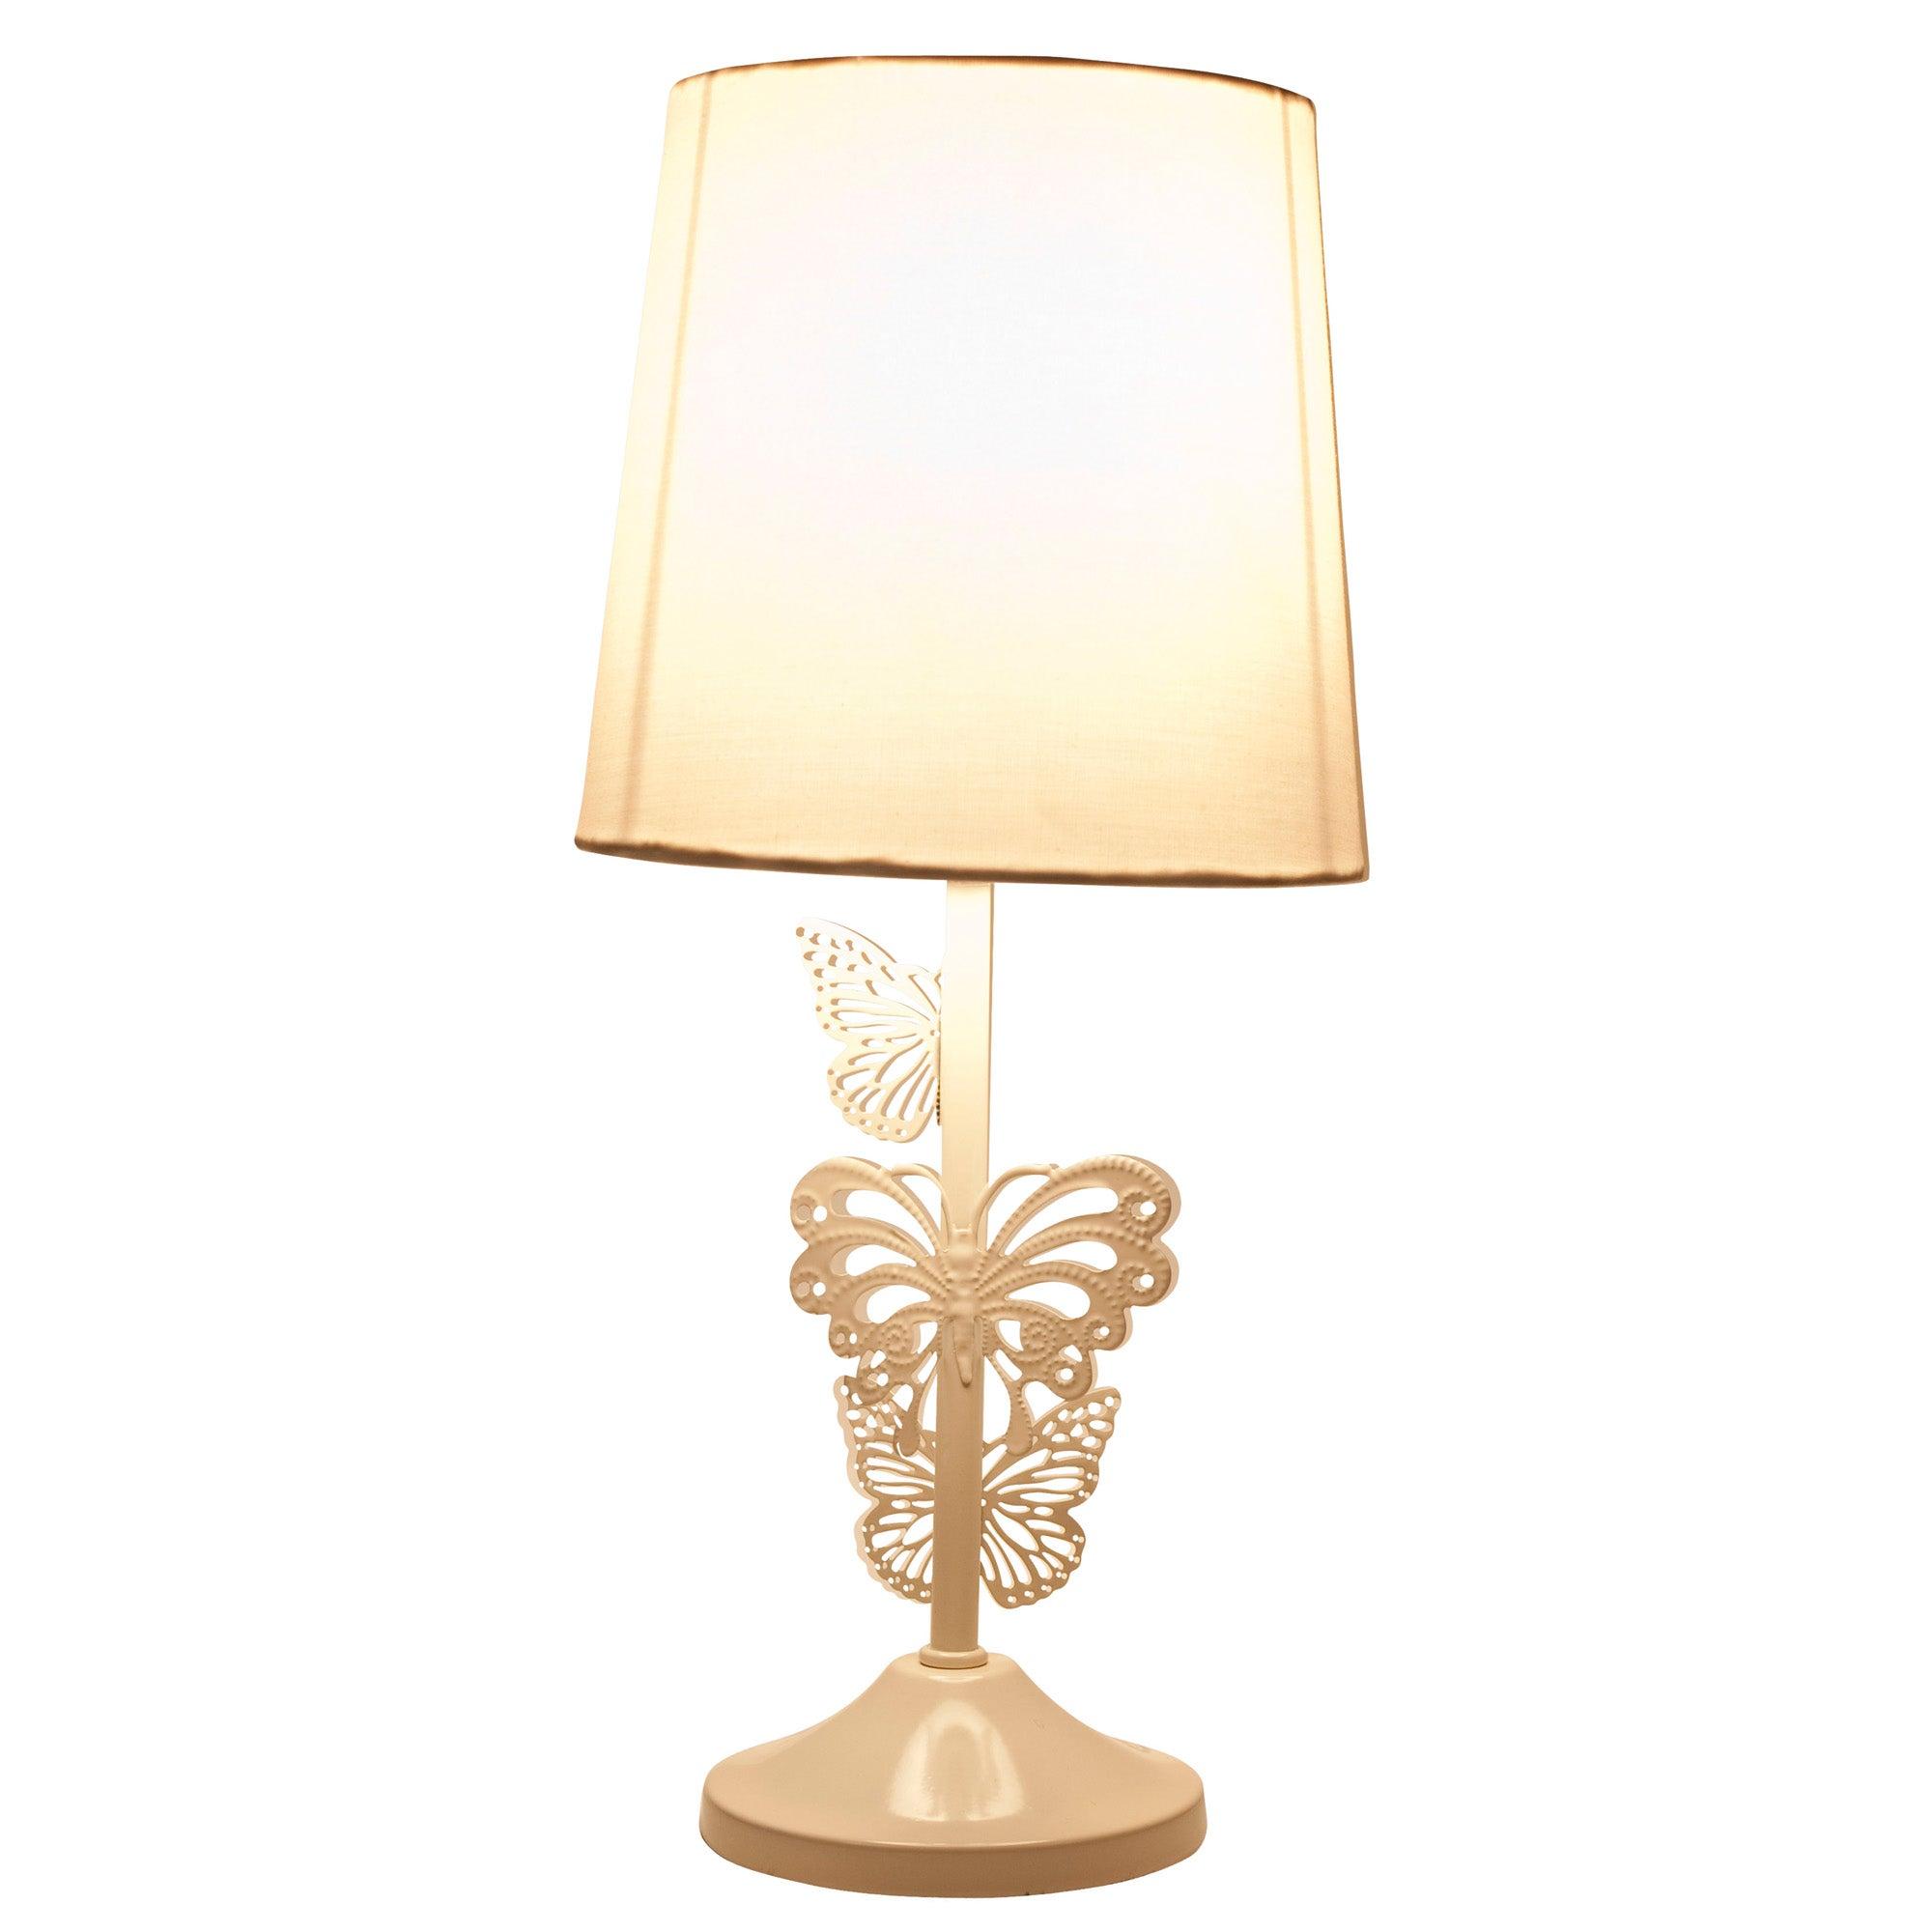 butterfly table lamp dunelm. Black Bedroom Furniture Sets. Home Design Ideas